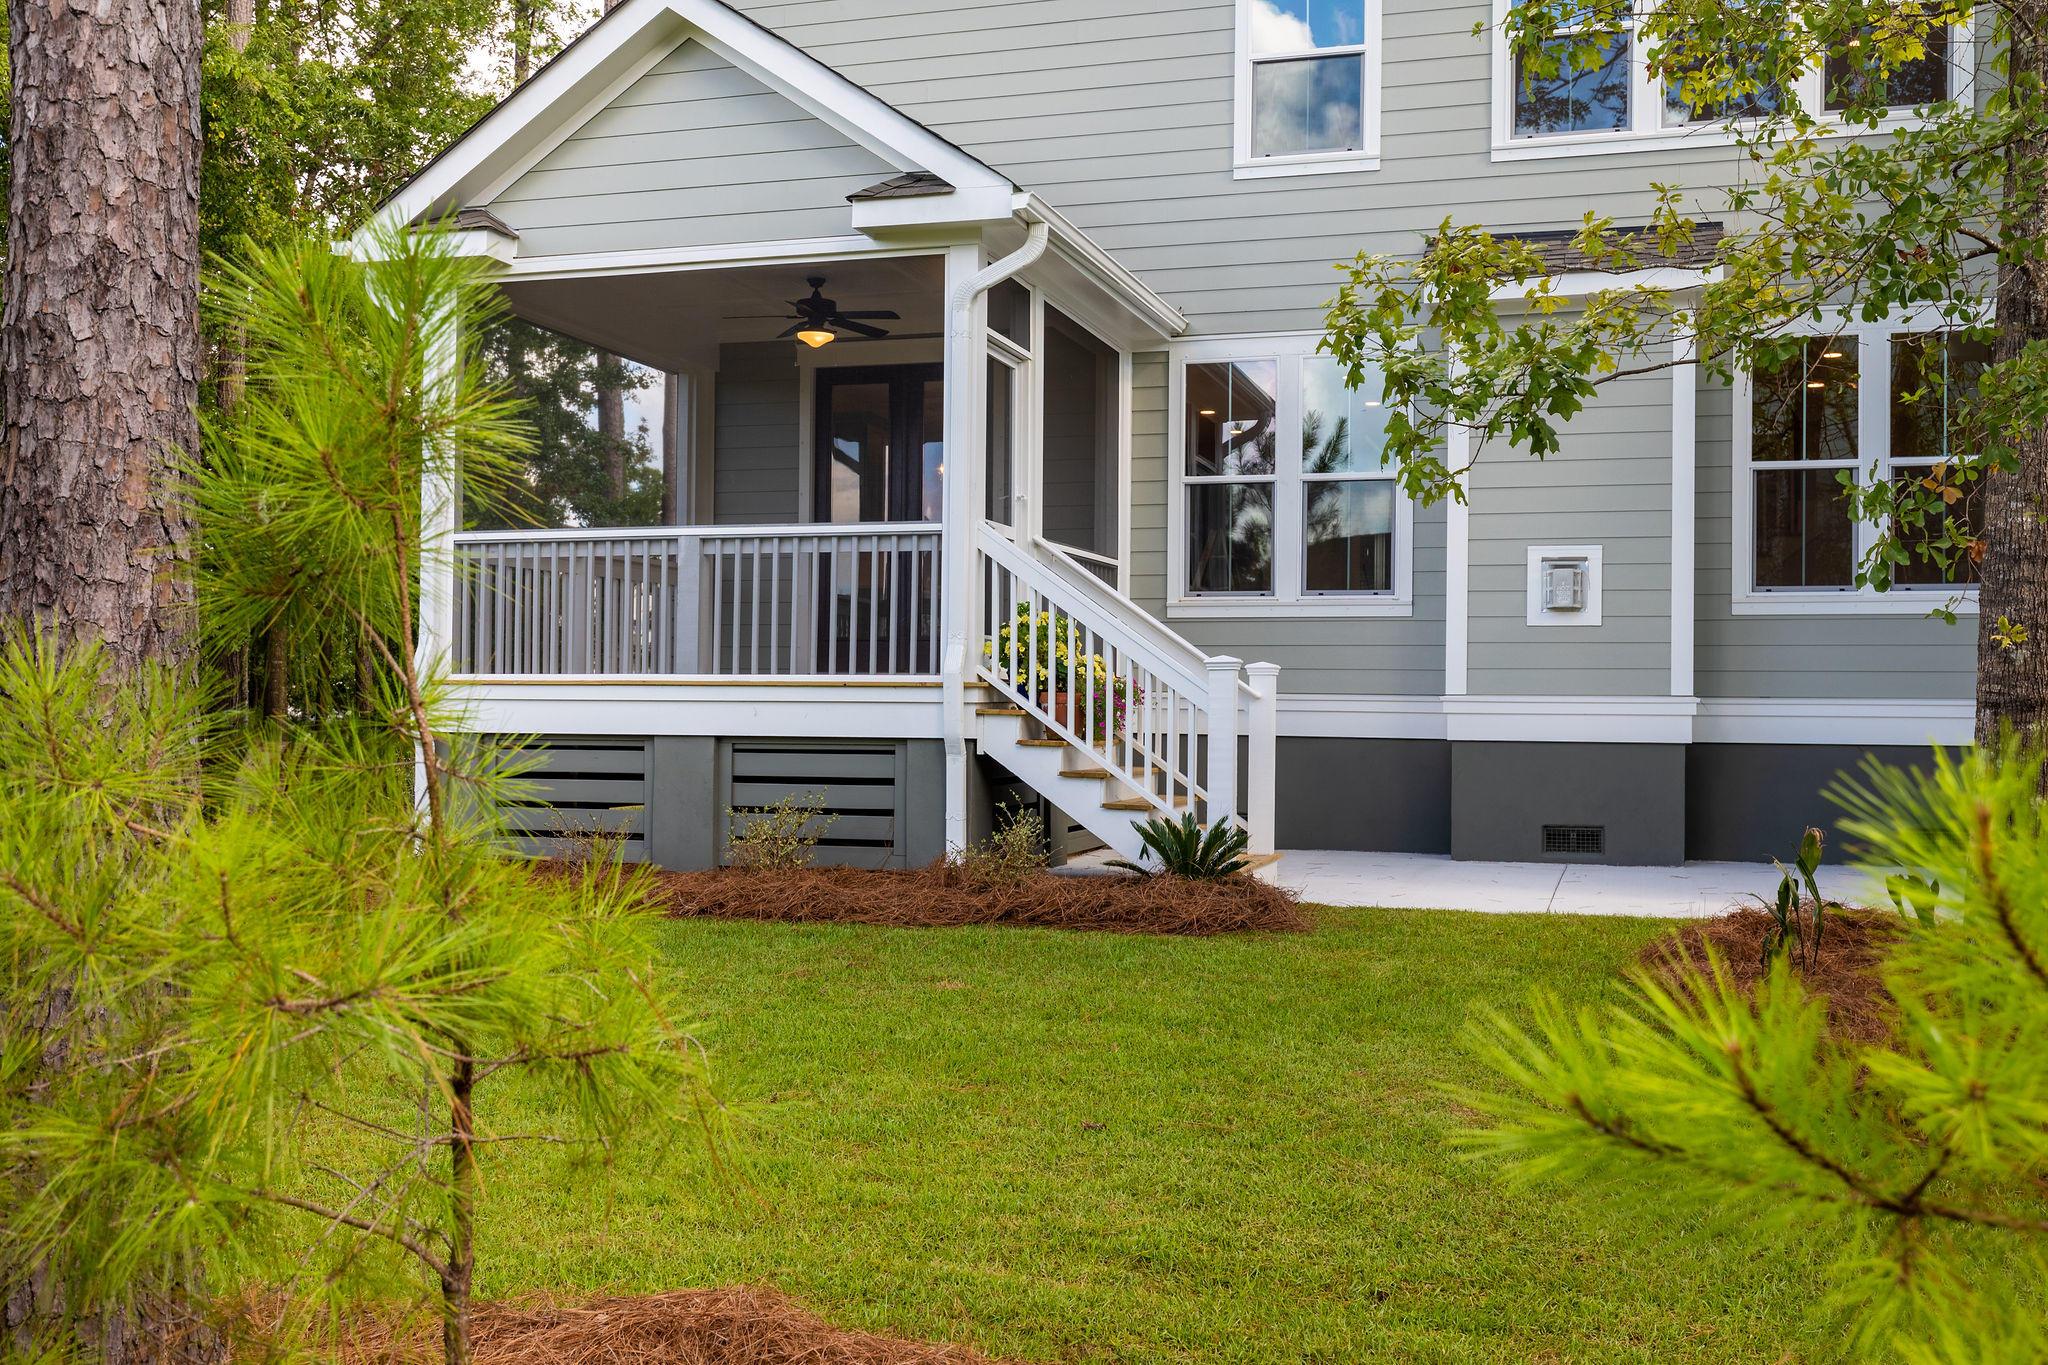 Park West Homes For Sale - 2291 Middlesex, Mount Pleasant, SC - 11